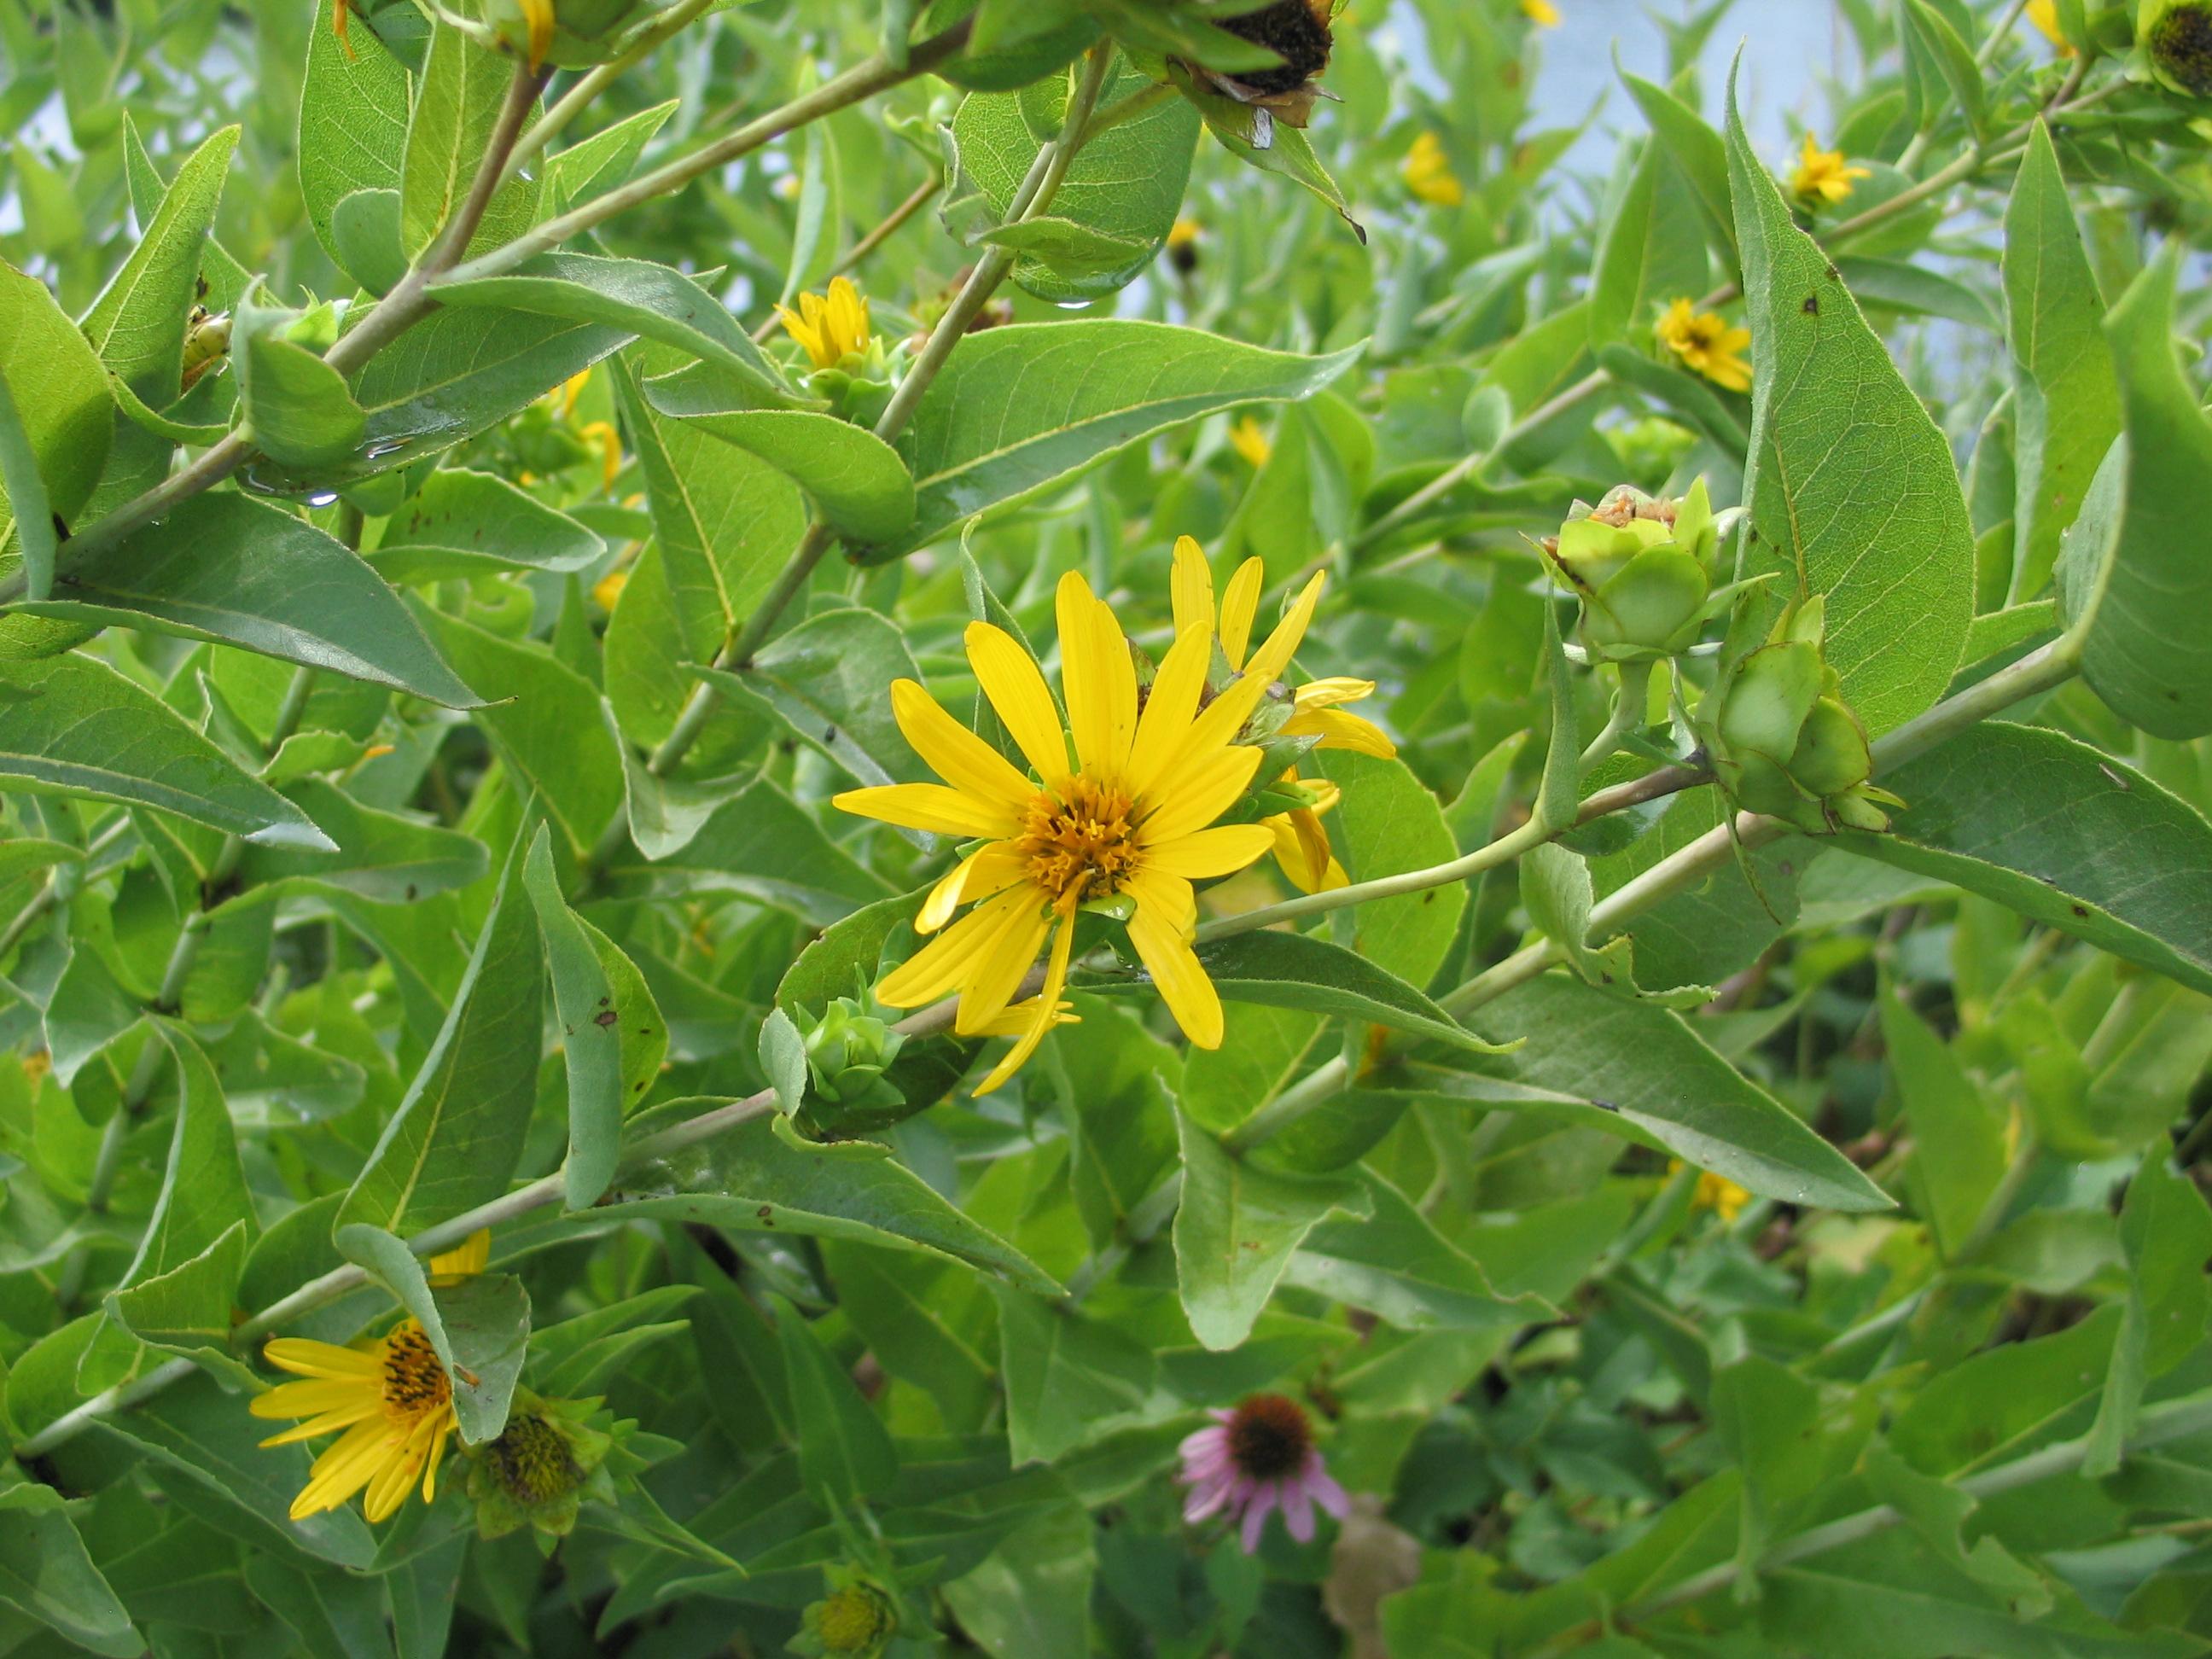 Dyck Arboretum Blog: Silphiums, Rosinweed